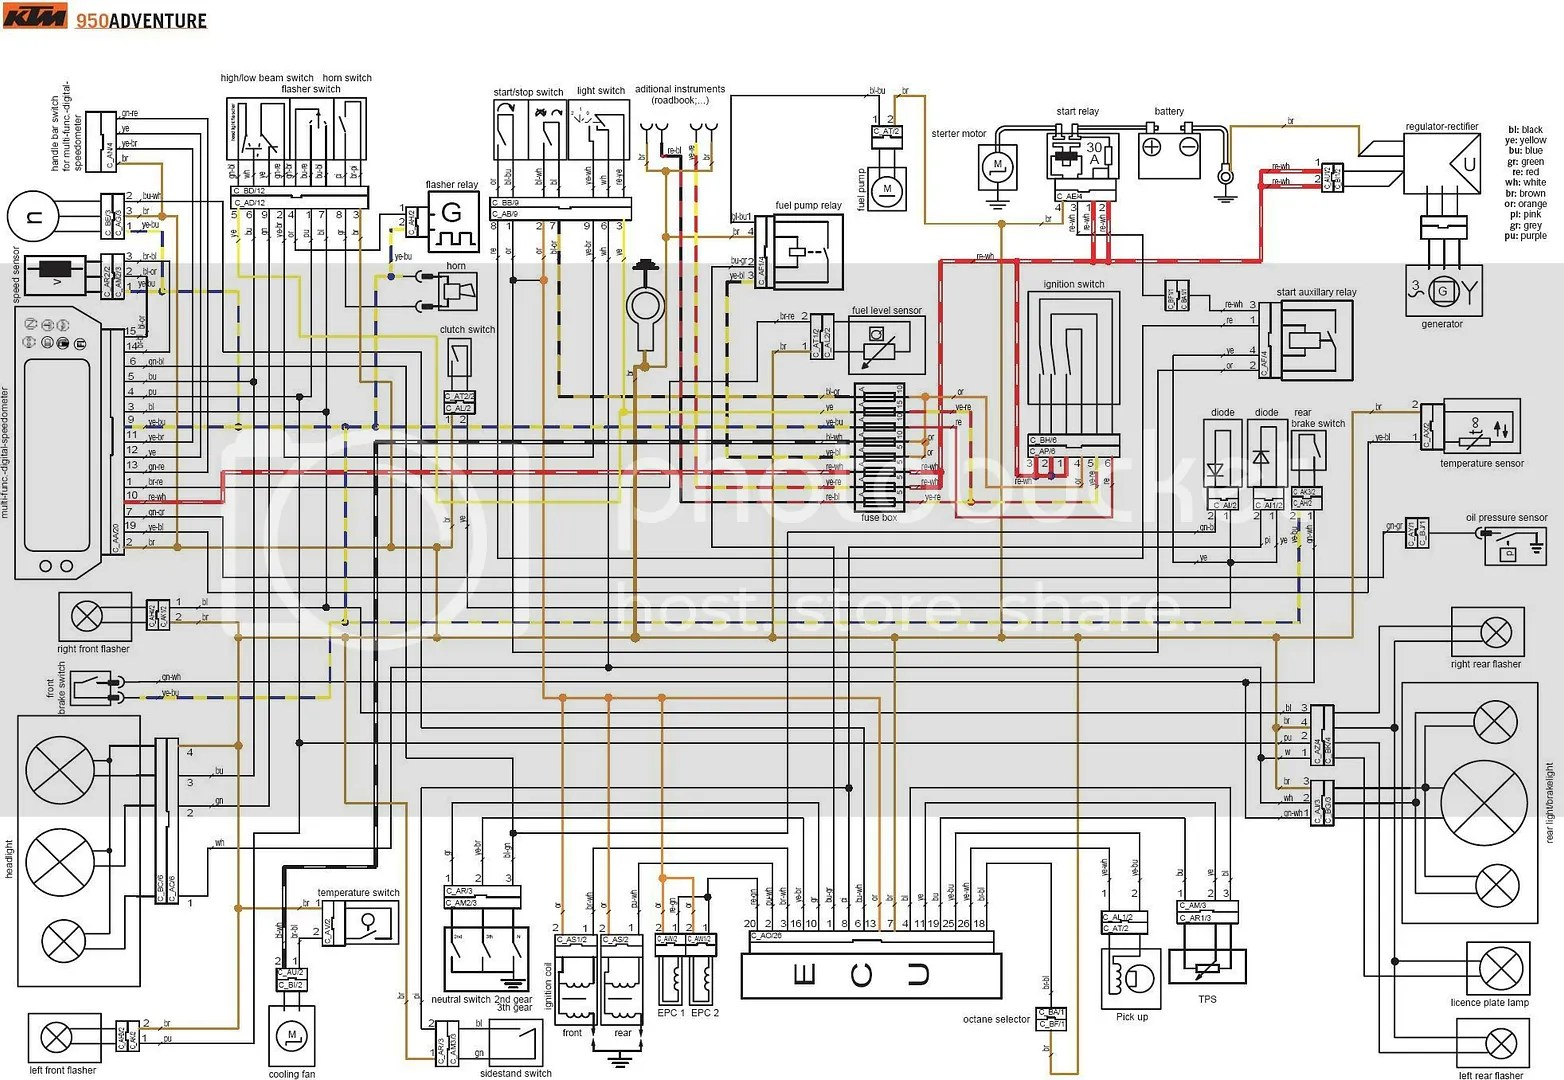 wiring diagram 1995 ktm lc4 wiring block diagram KTM Wiring-Diagram Horn 1995 ktm wiring diagram manual e books 1994 ktm wiring diagram wiring diagram 1995 ktm lc4